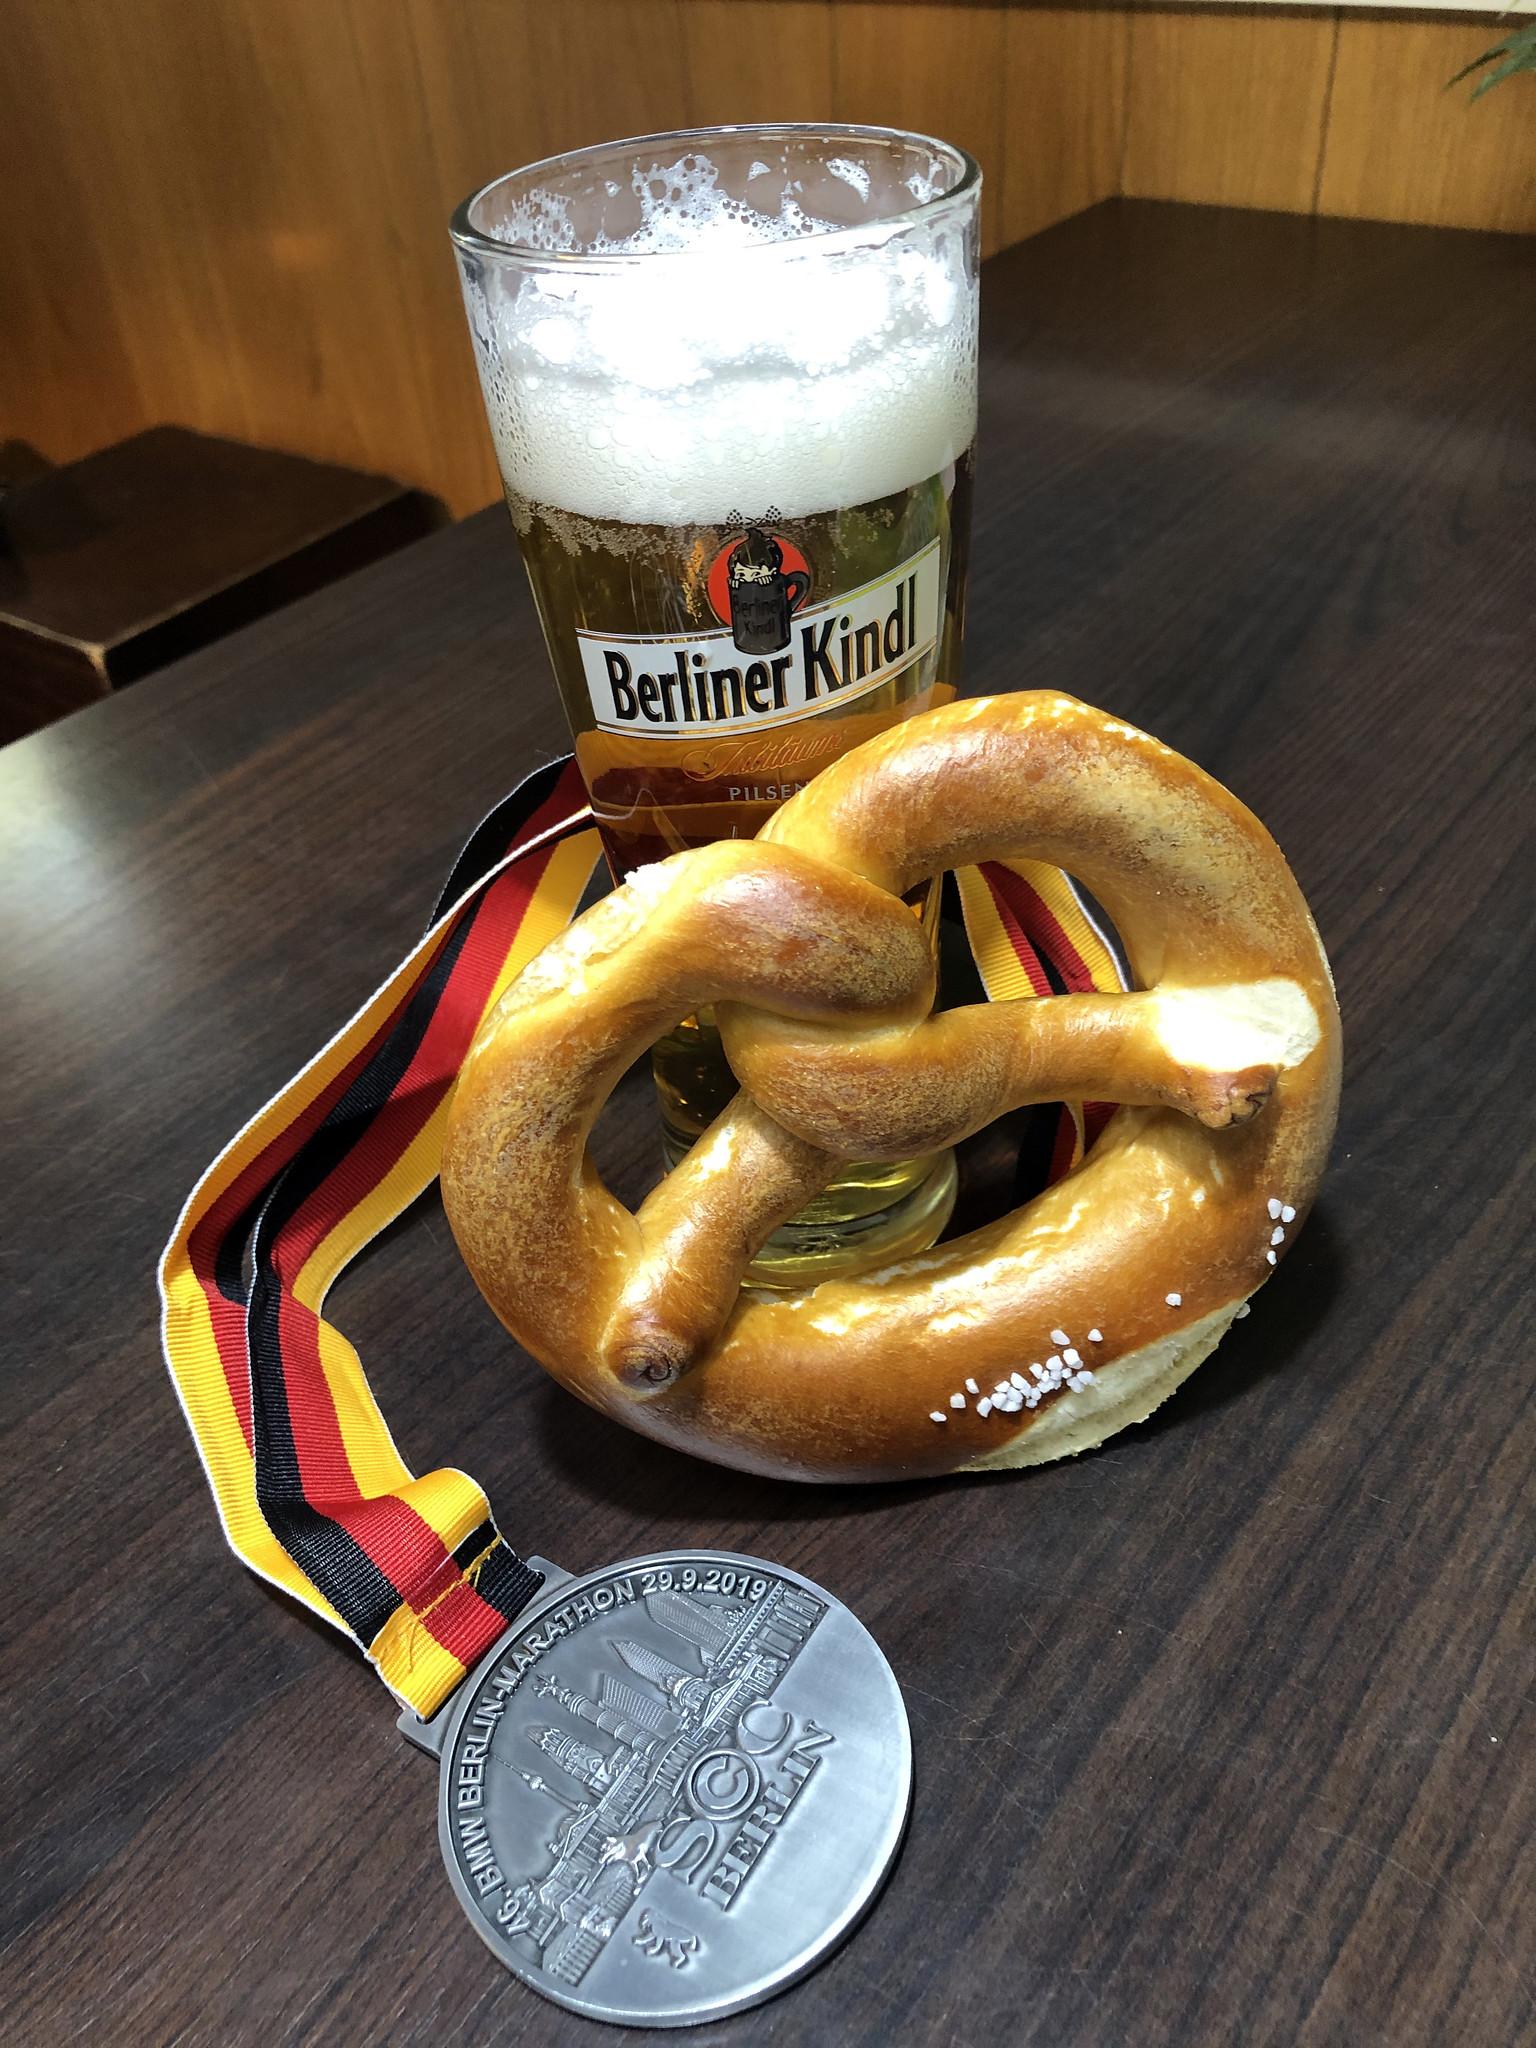 Correr el Maratón de Berlín - Berlin Marathon fotos photos - thewotme maratón de berlín - 49039075566 907ed01306 k - Correr el Maratón de Berlín: Análisis, recorrido, entrenamiento e inscripciones